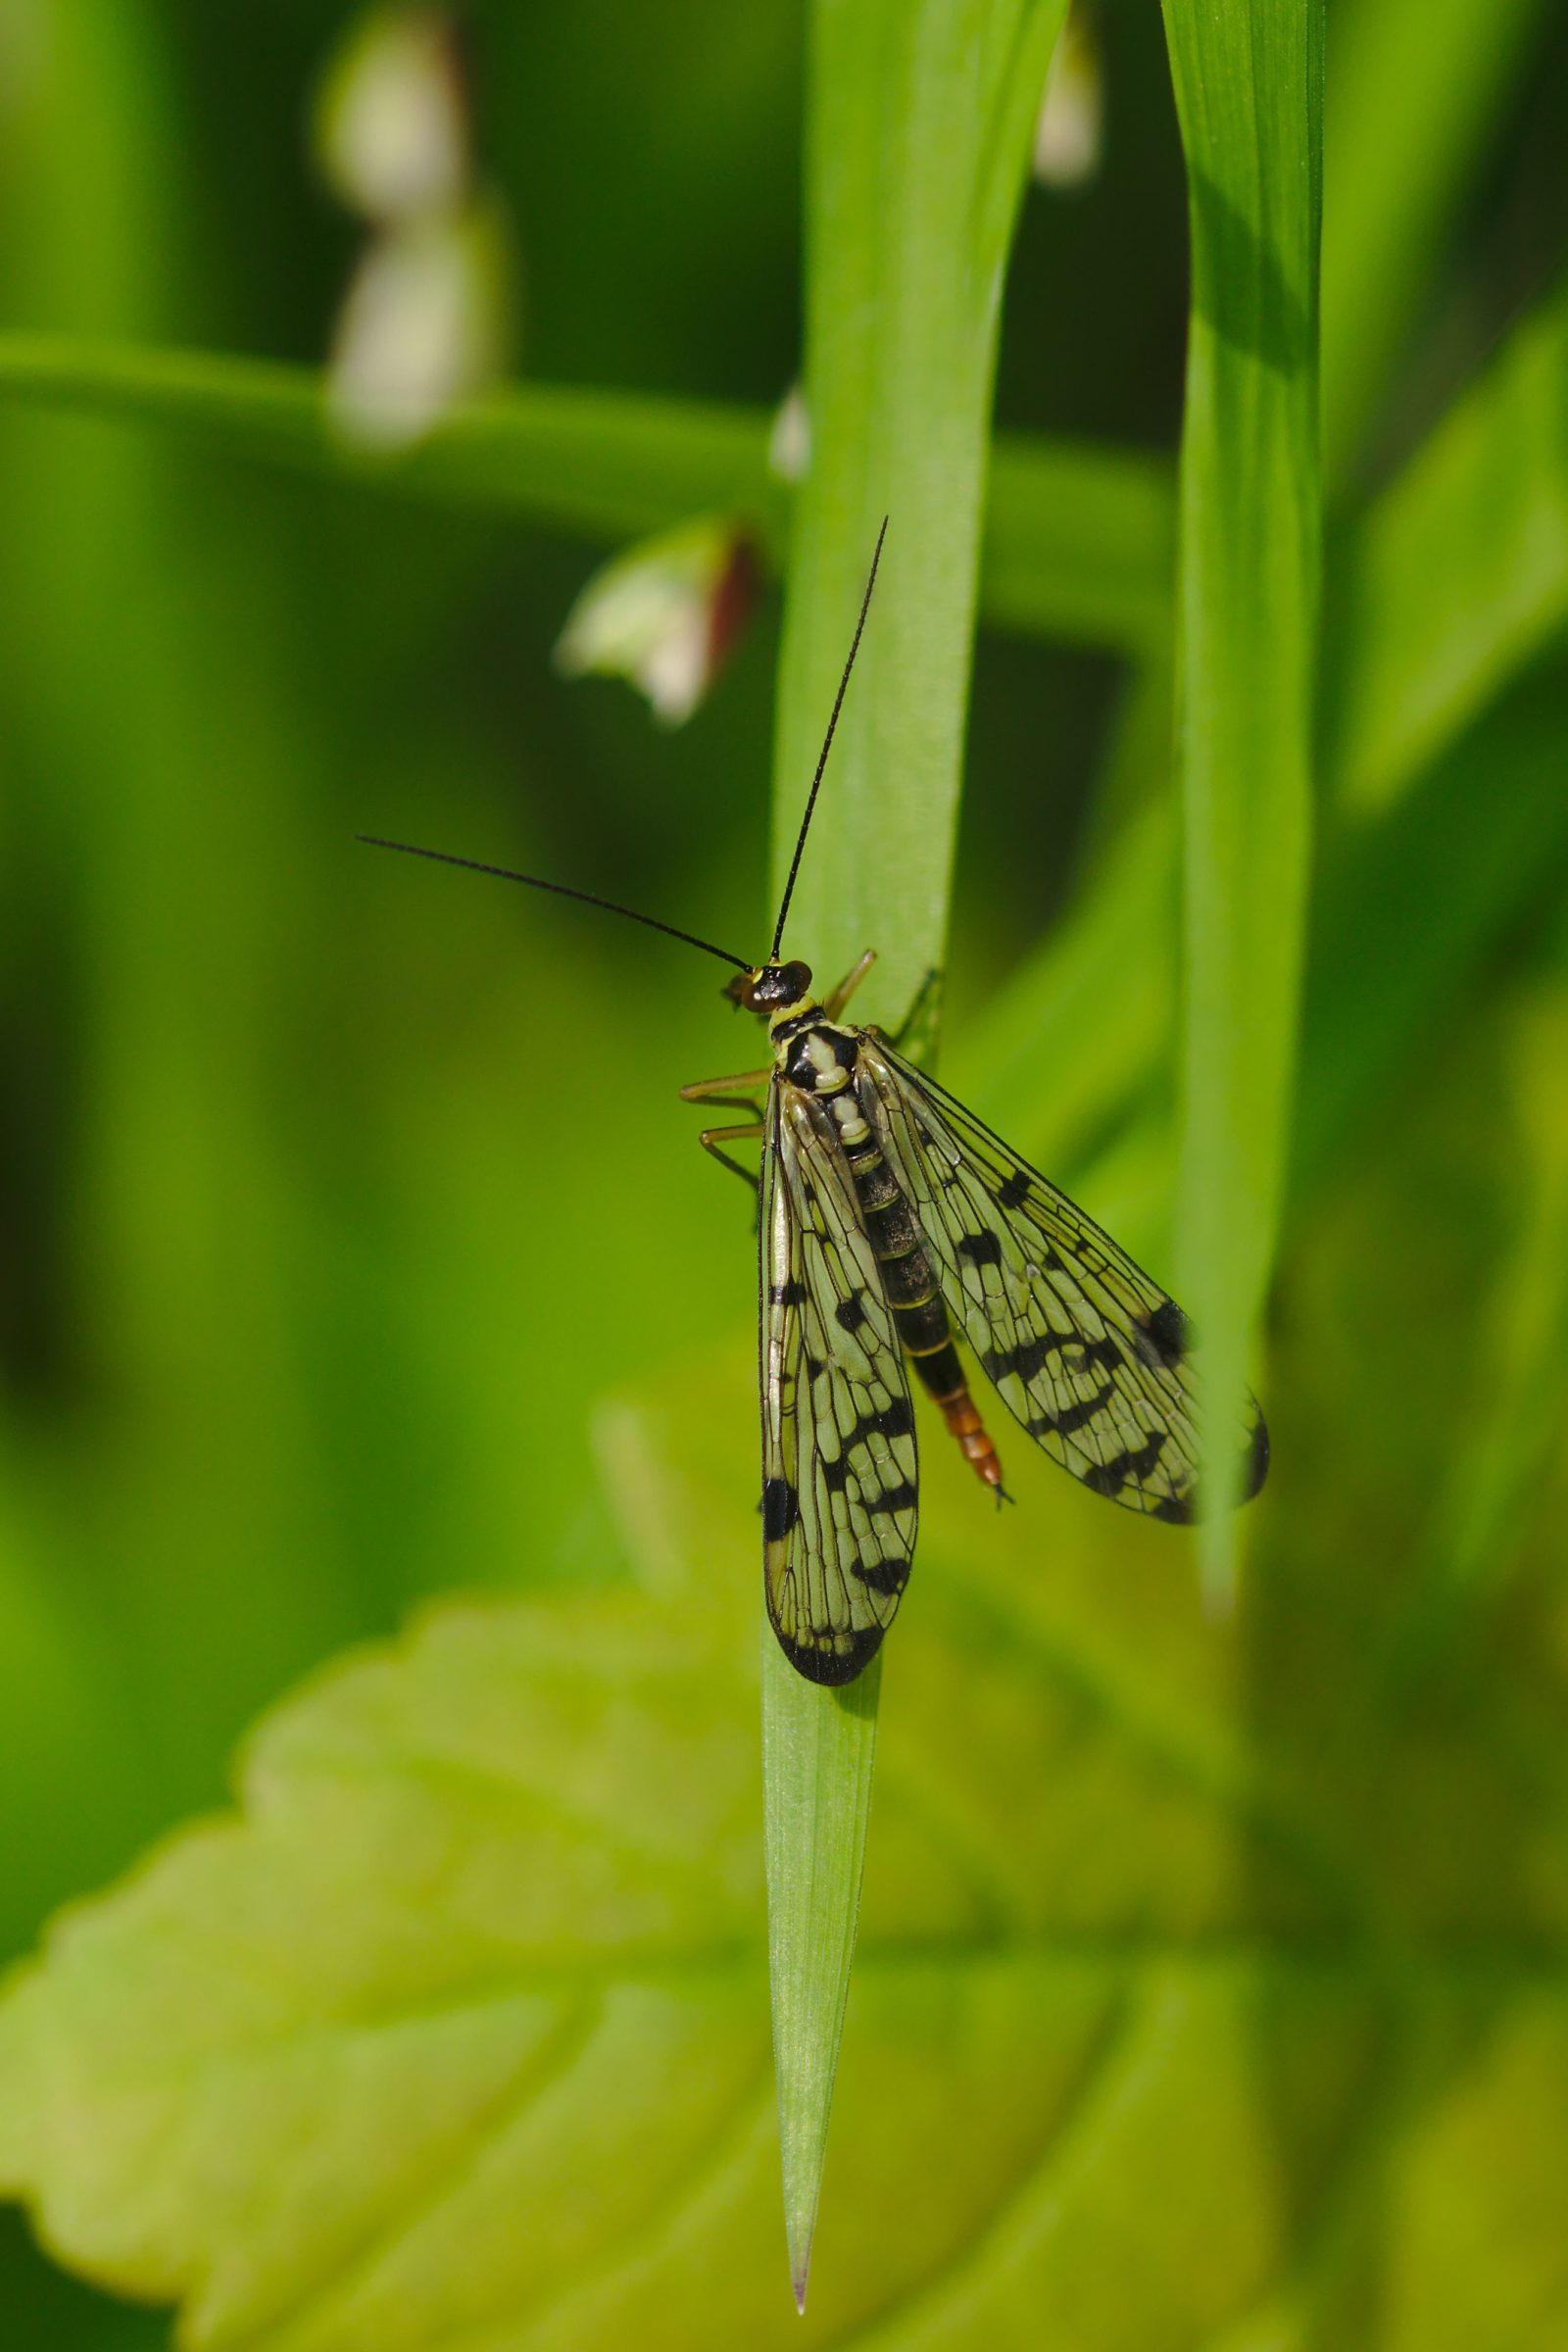 "<a href=""/panorpa-germanica/"" target=""_blank"" rel=""noopener noreferrer""><i>Panorpa germanica</i> (Deutsche Skorpionsfliege)</a>"